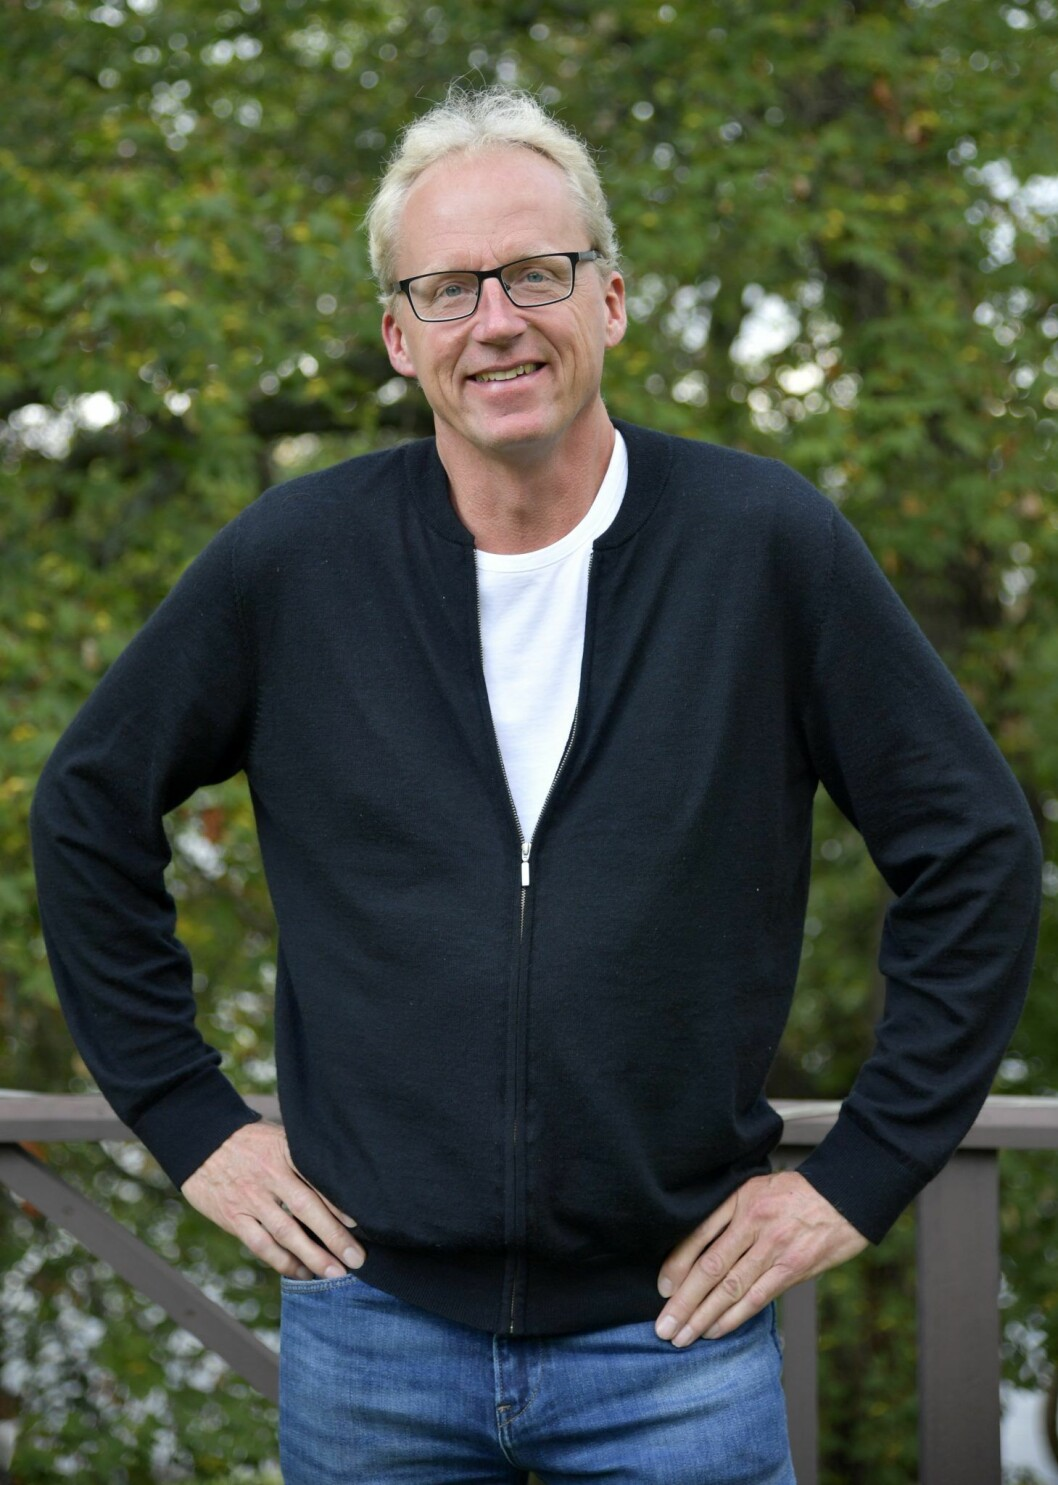 Uffe i Bonde söker fru 2019